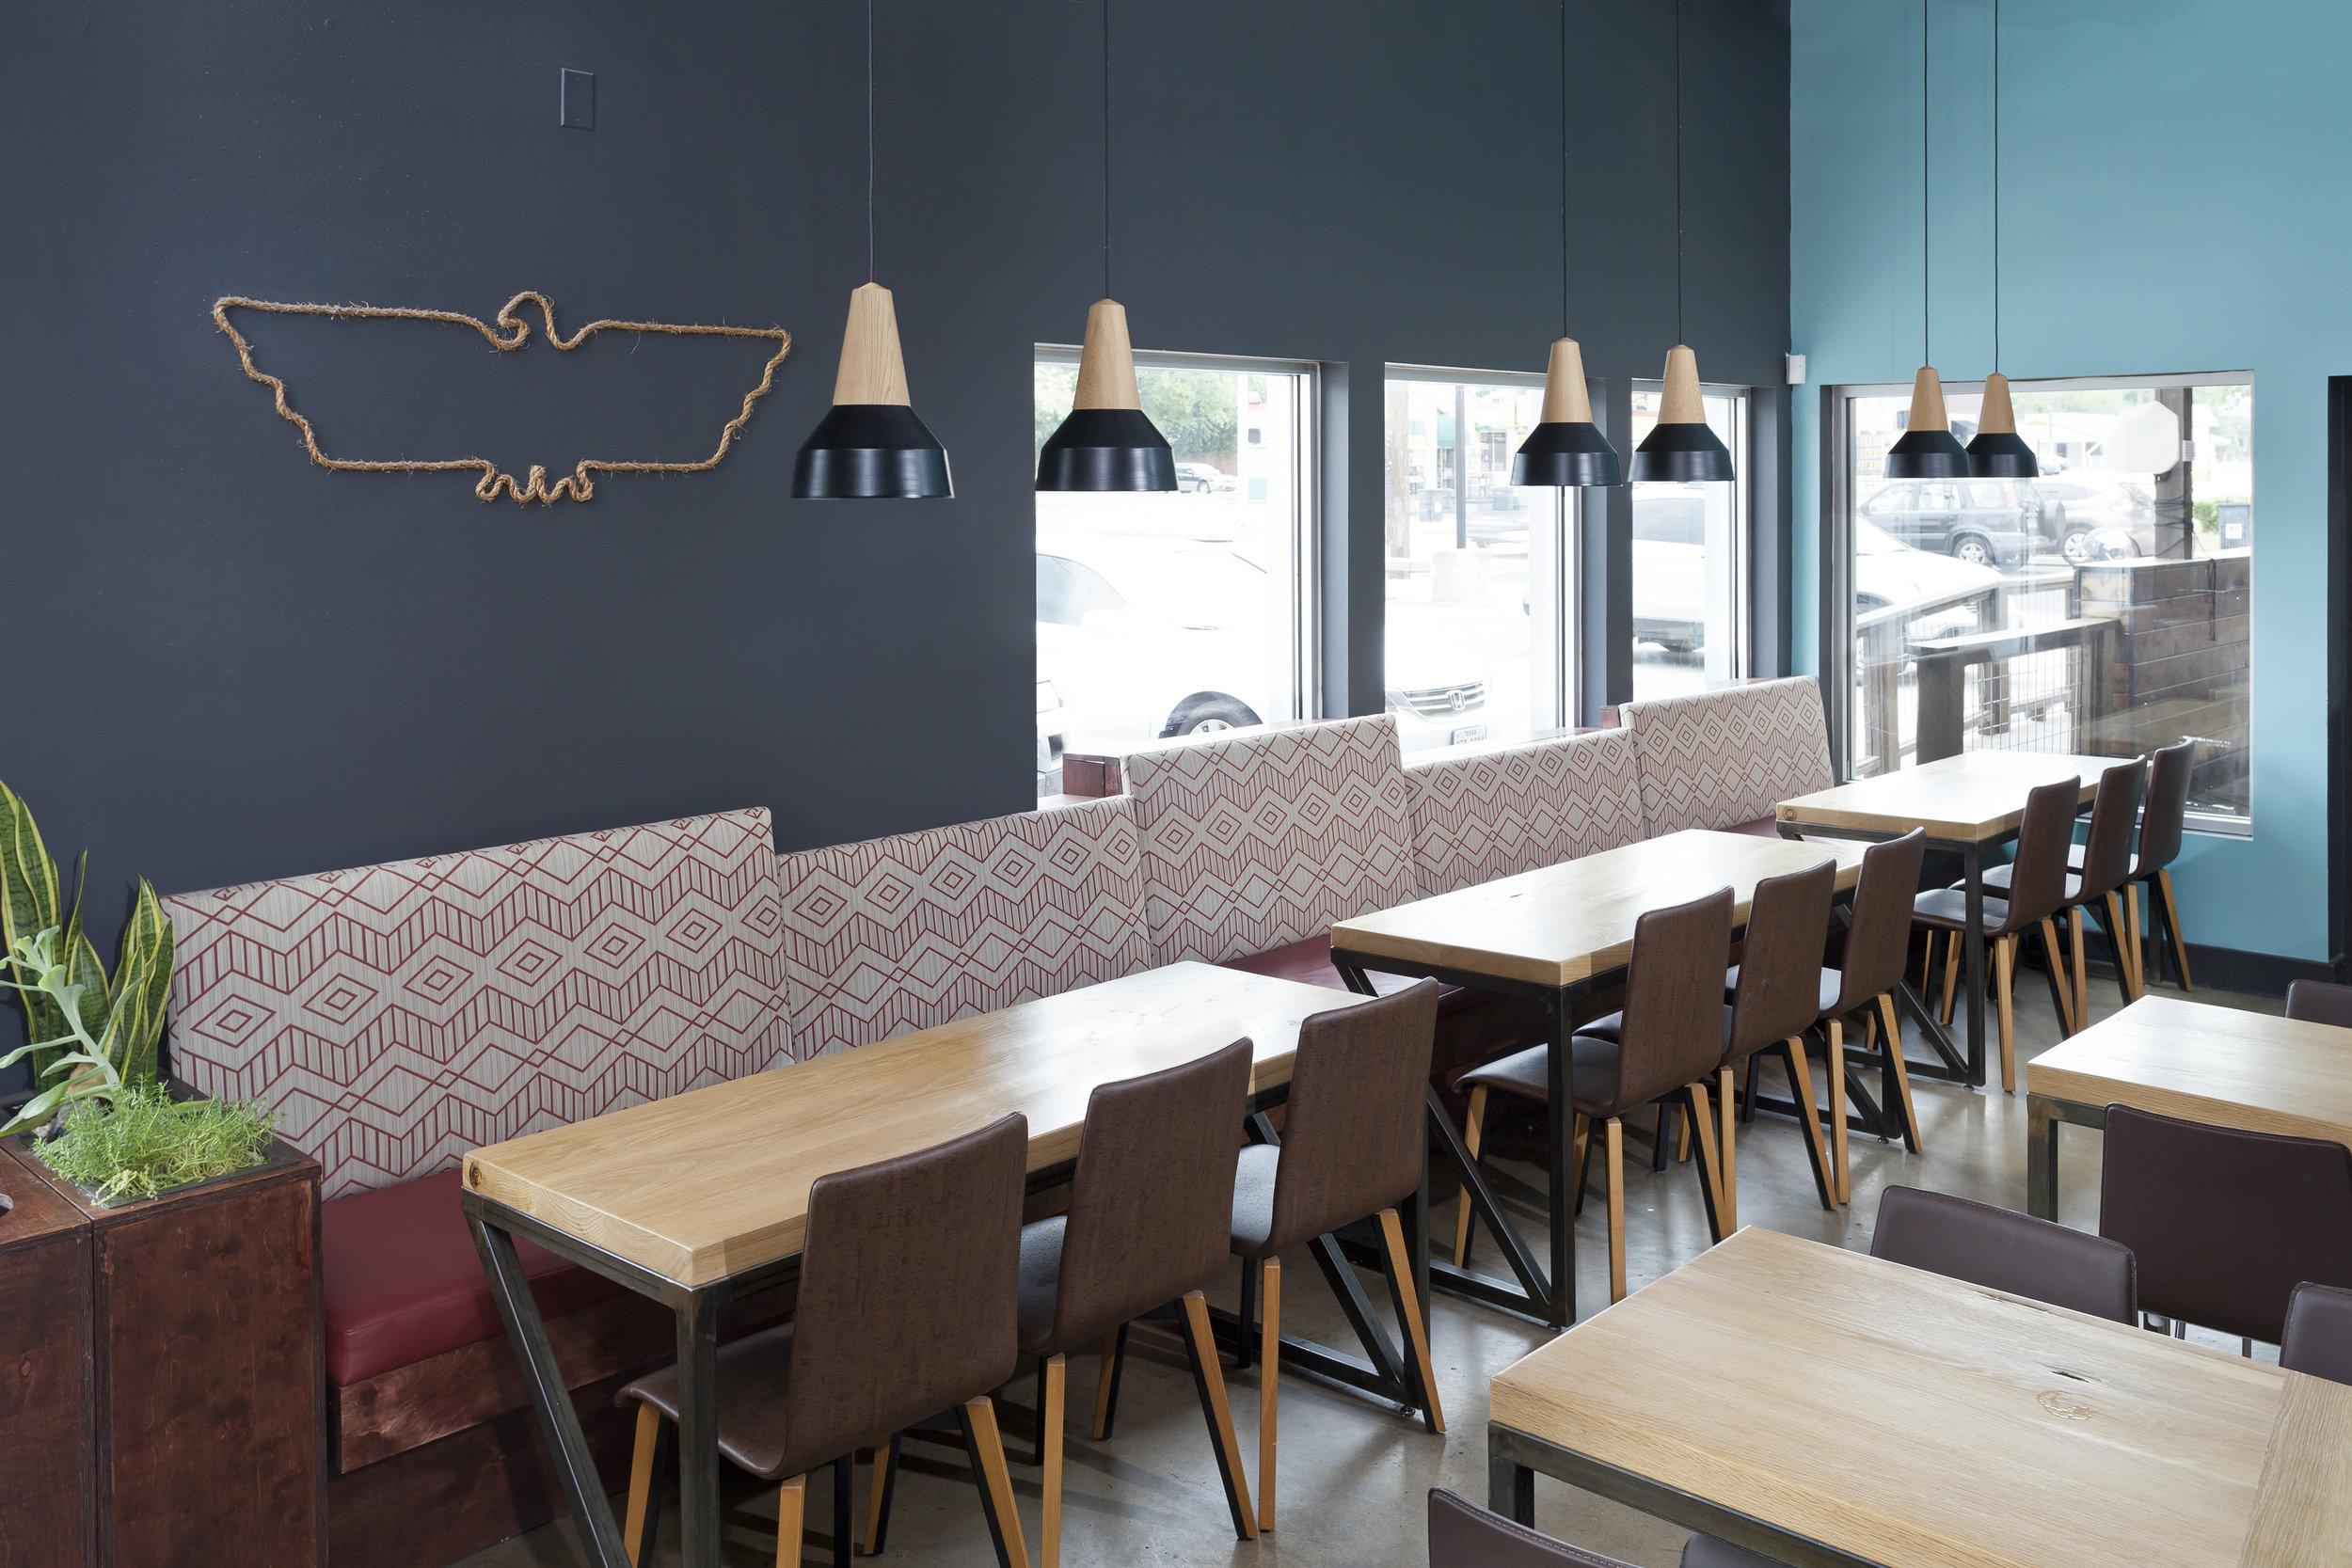 Thunderbird Café and Taproom